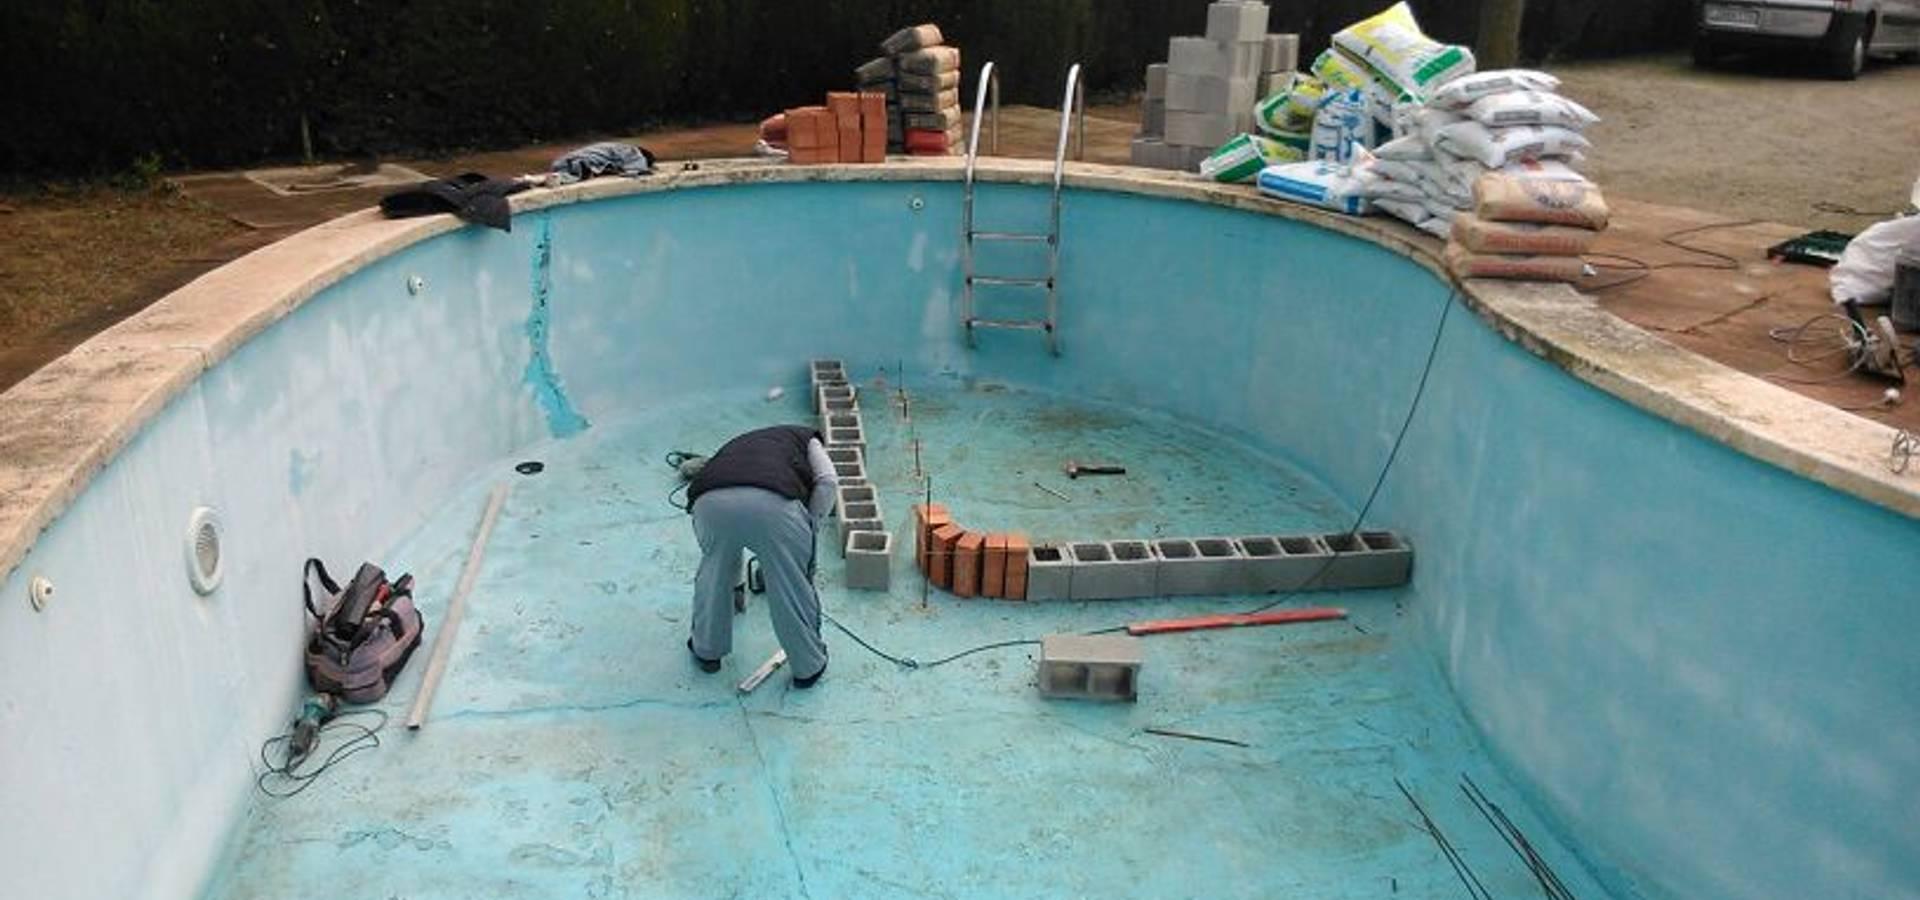 Renovaci n de piscina con sistema de l mina armada de pvc for Piscinas desmontables de pvc